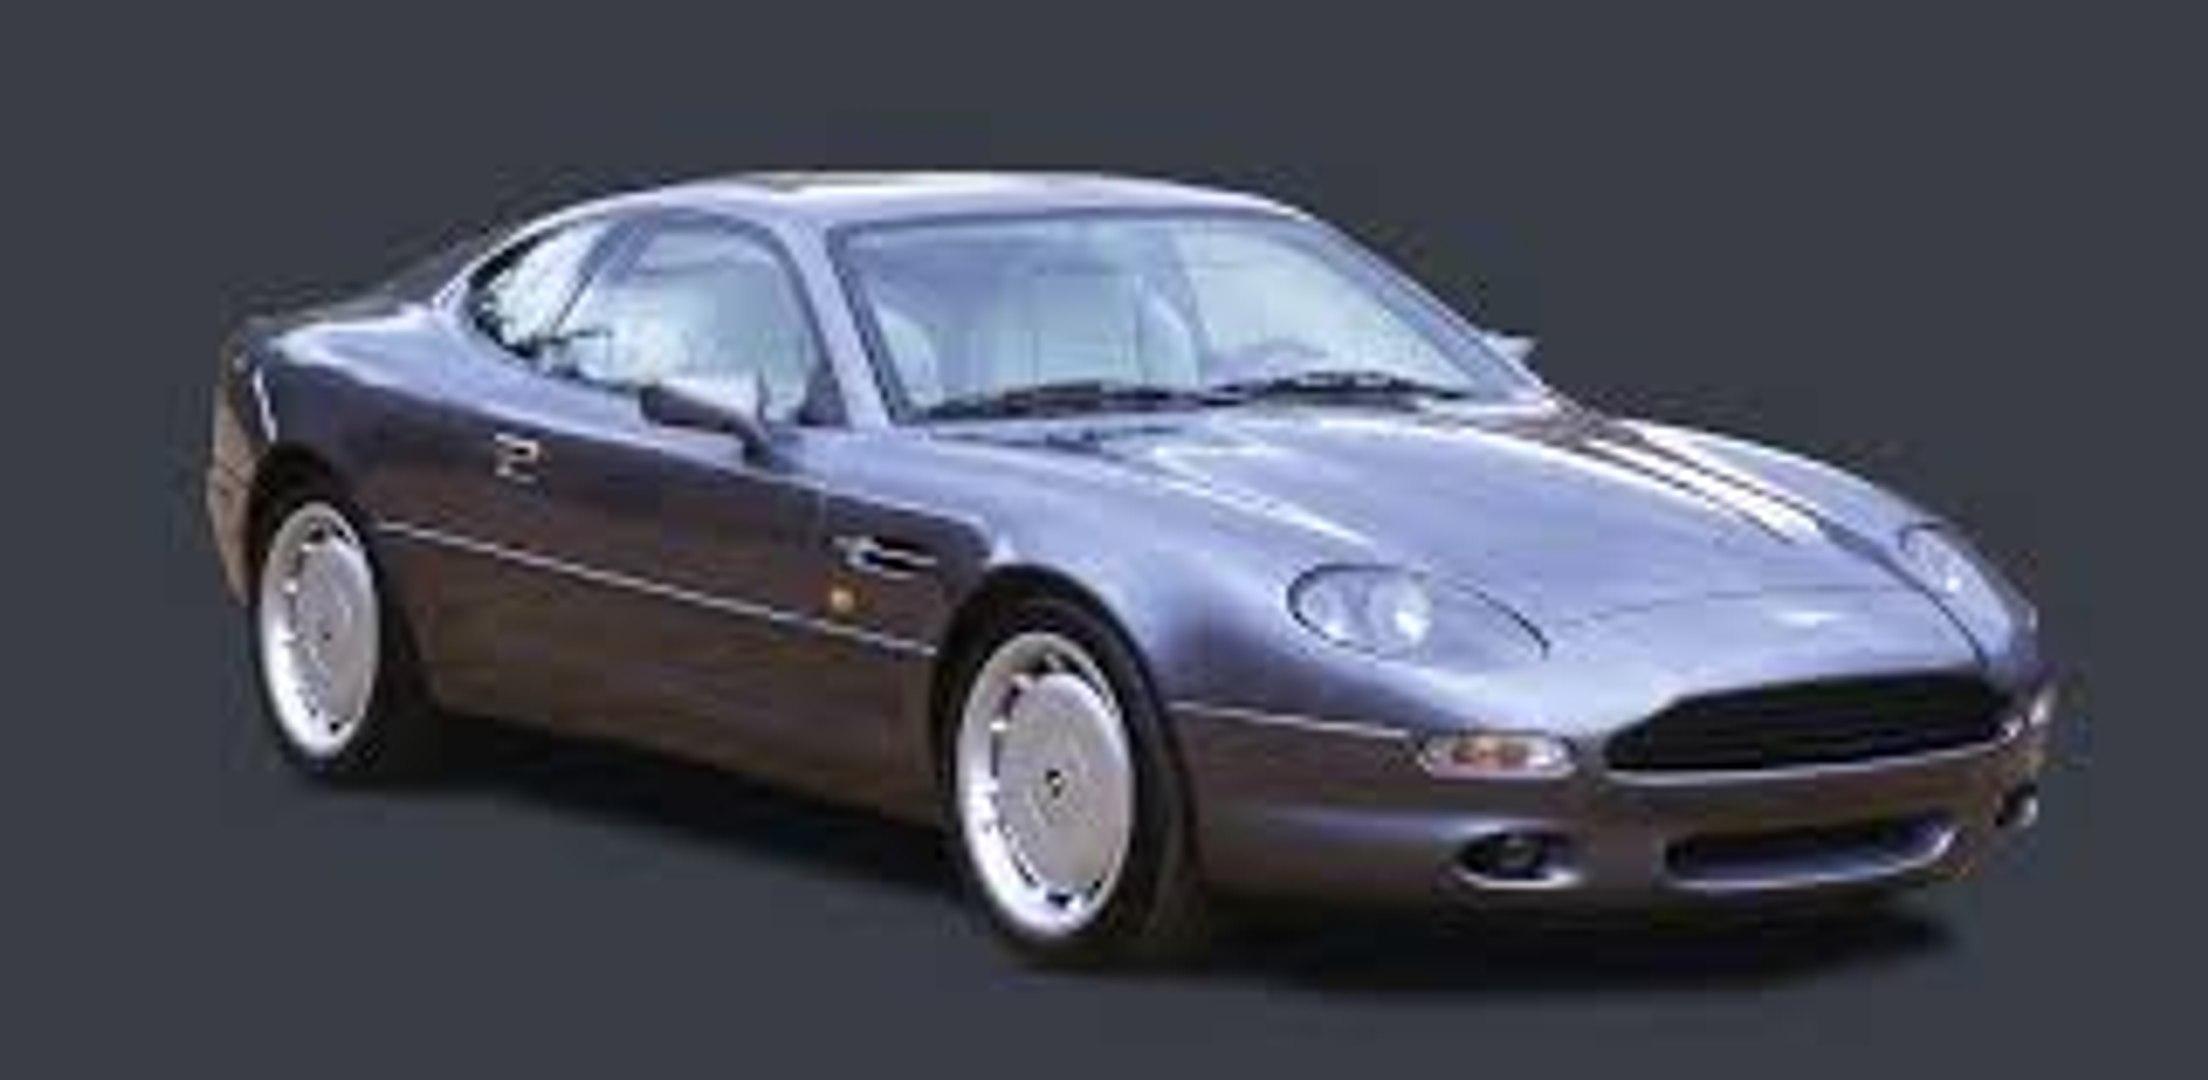 Occasions A Saisir S10 E01 Aston Martin Db7 1996 Video Dailymotion